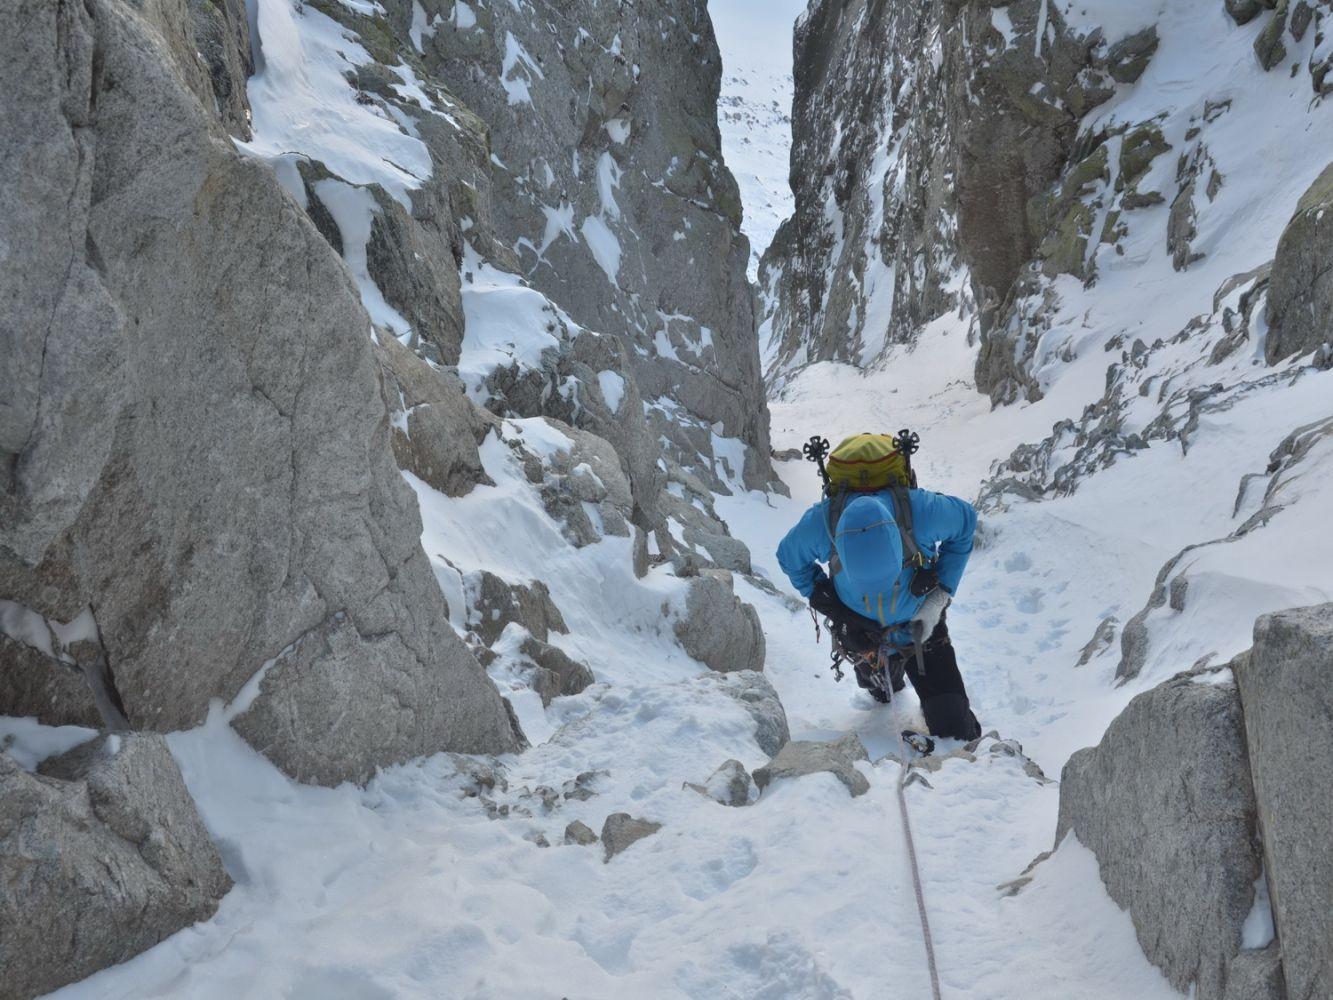 alpinisme_hiver_afdv_18